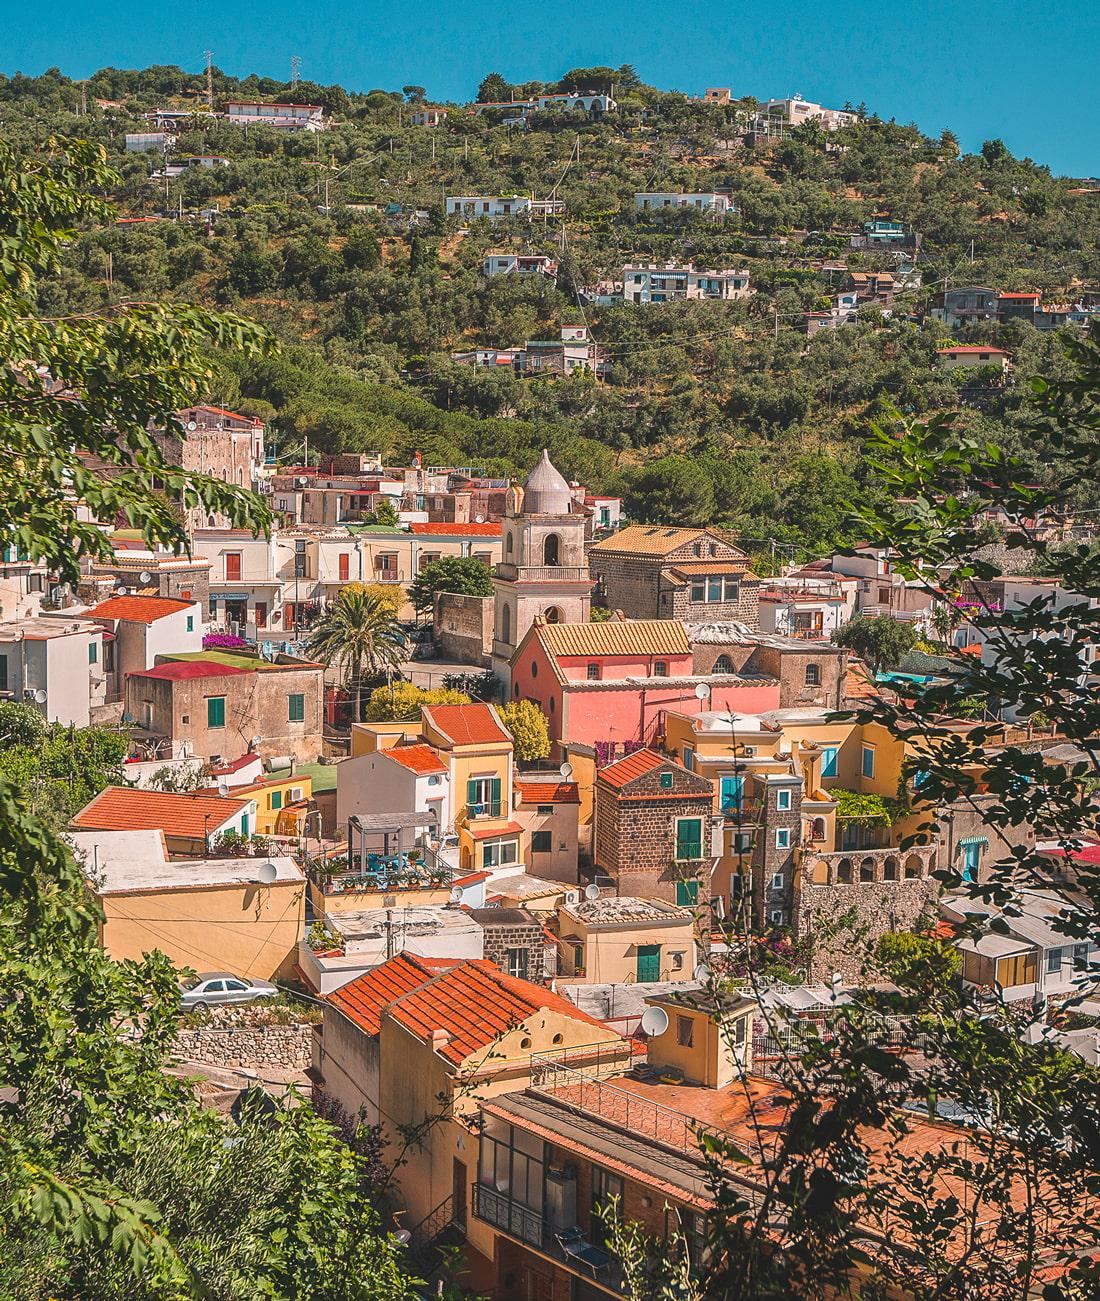 Beautiful town on the Amalfi Coast